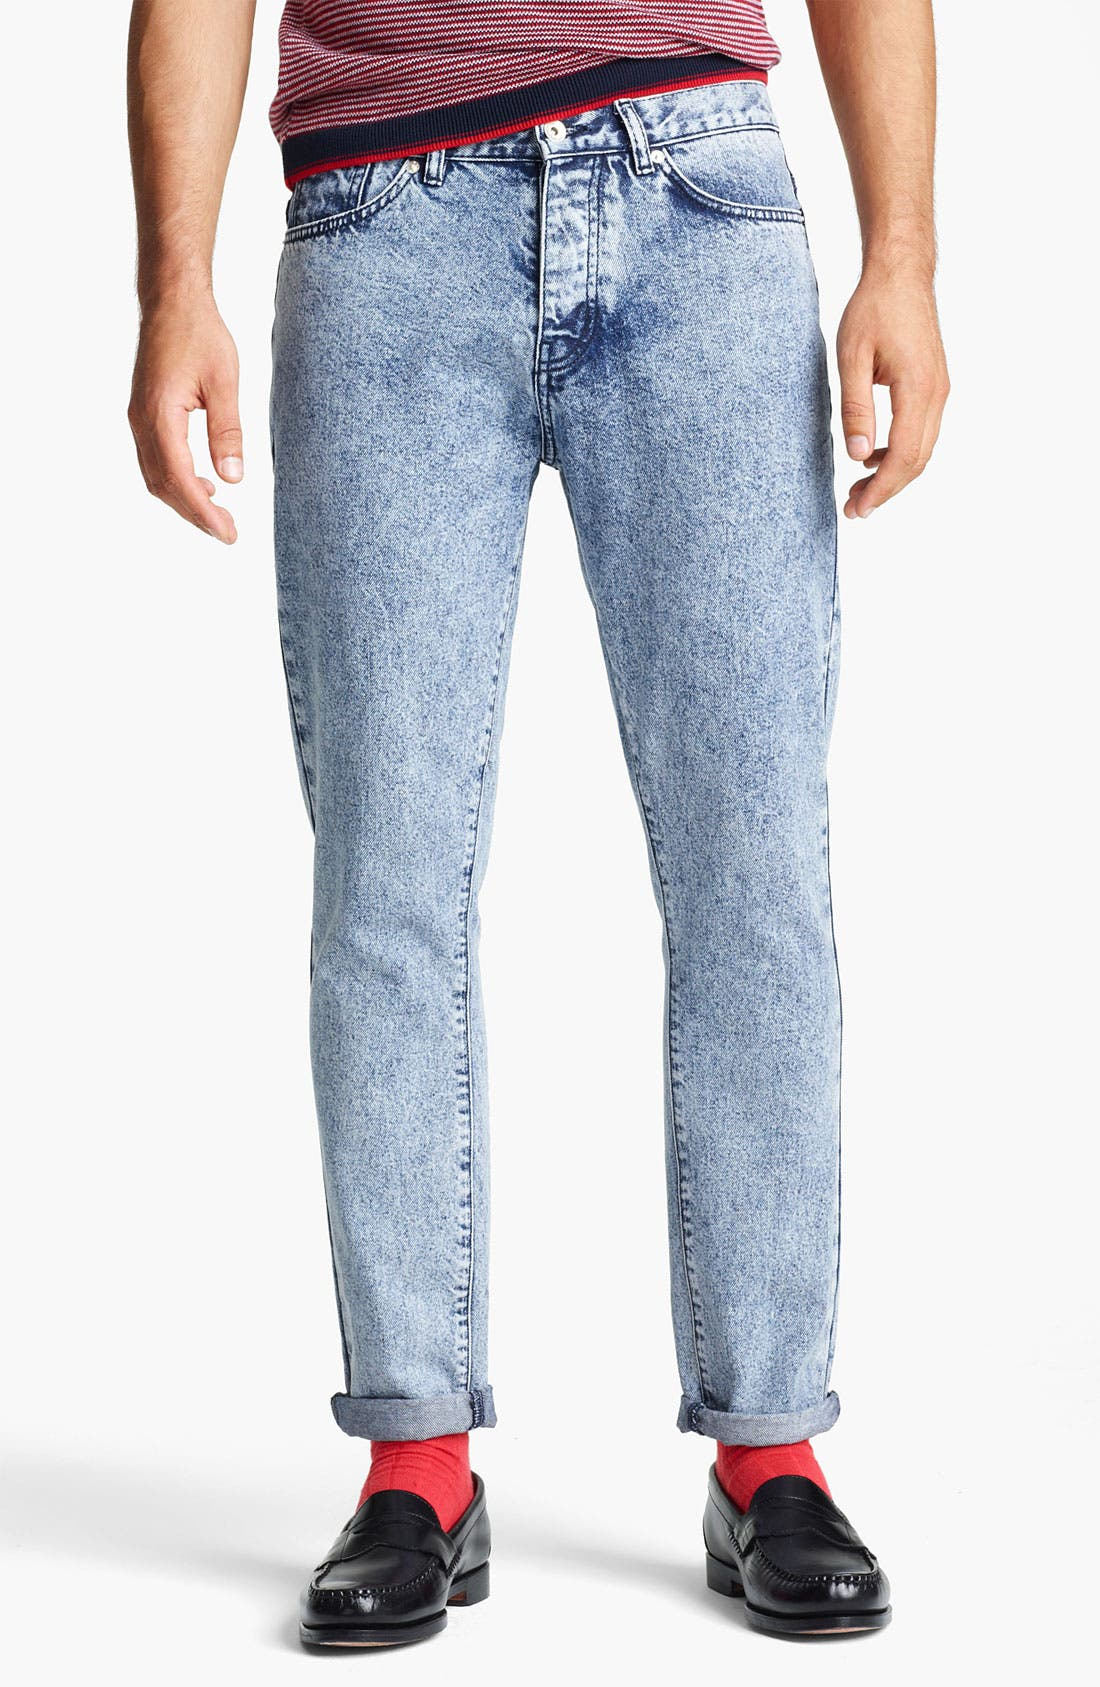 Alternate Image 1 Selected - Topman Vintage Skinny Jeans (Light Wash)